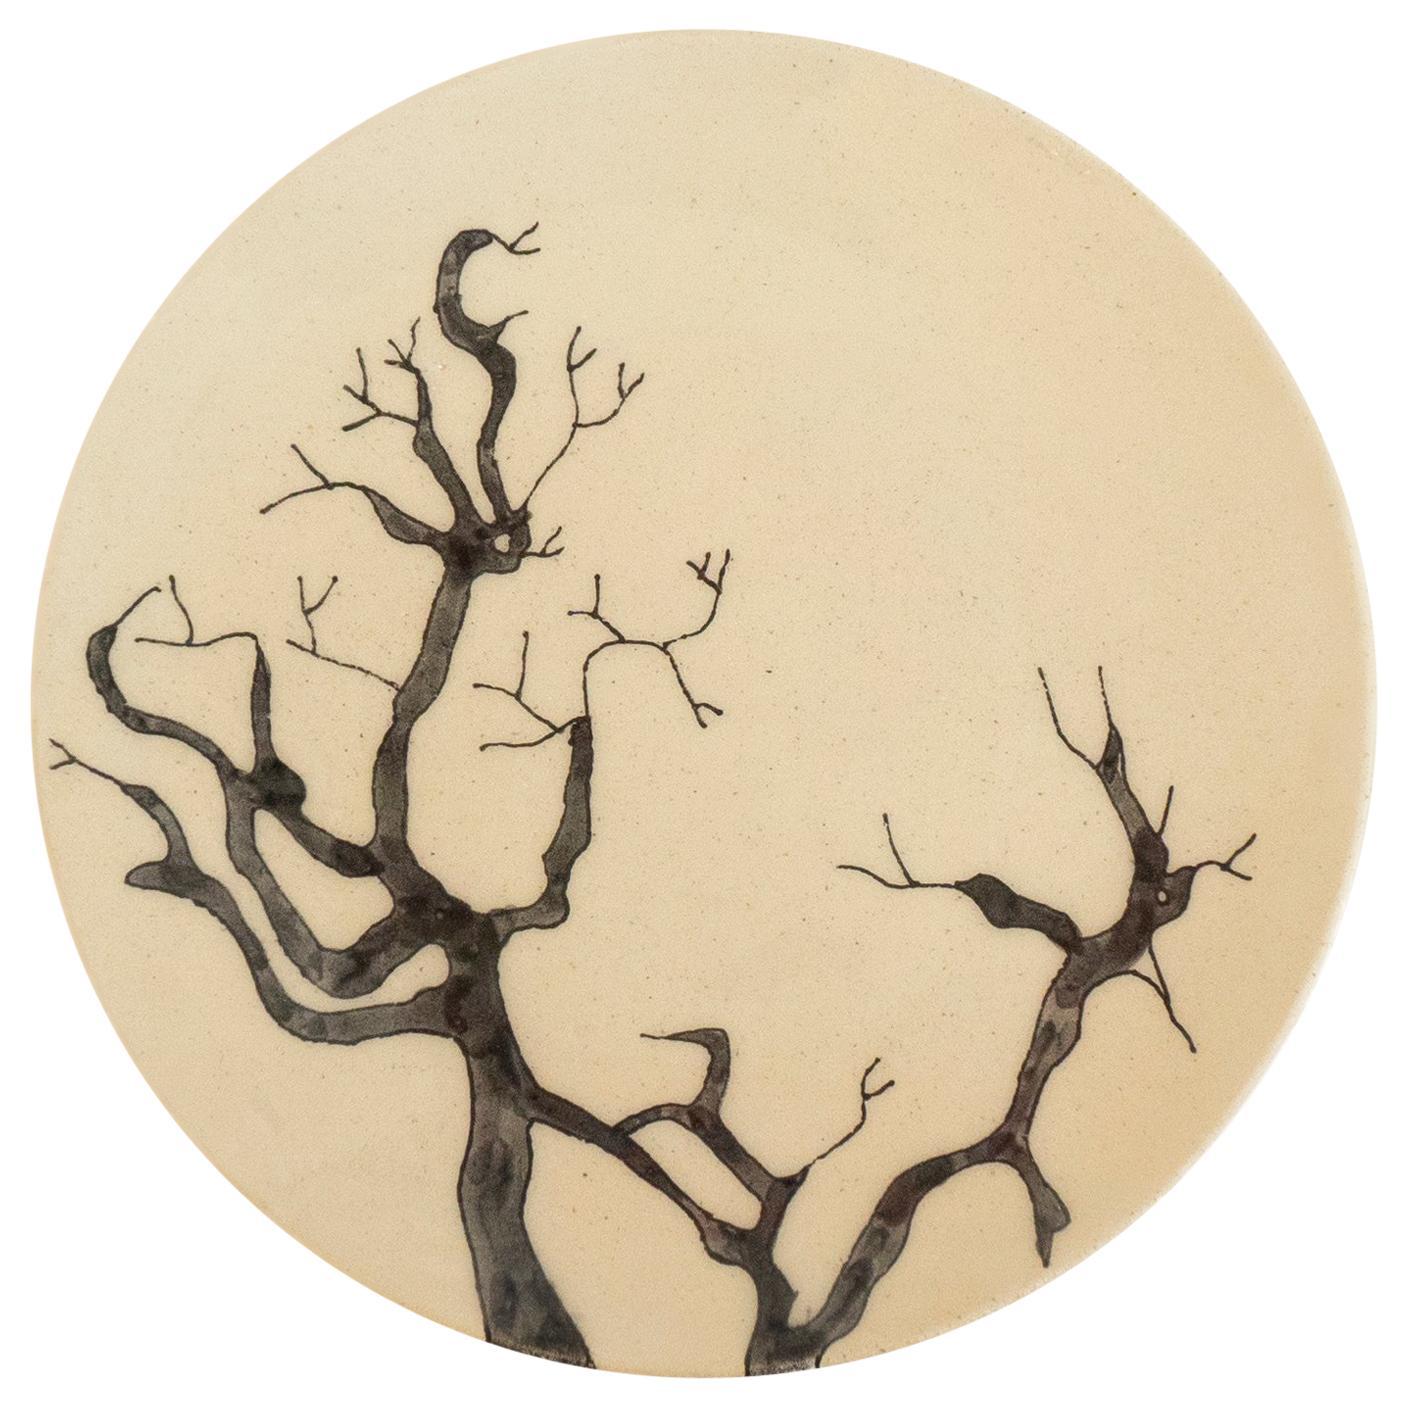 Small Handmade Ceramic Plates with Tree Illustration